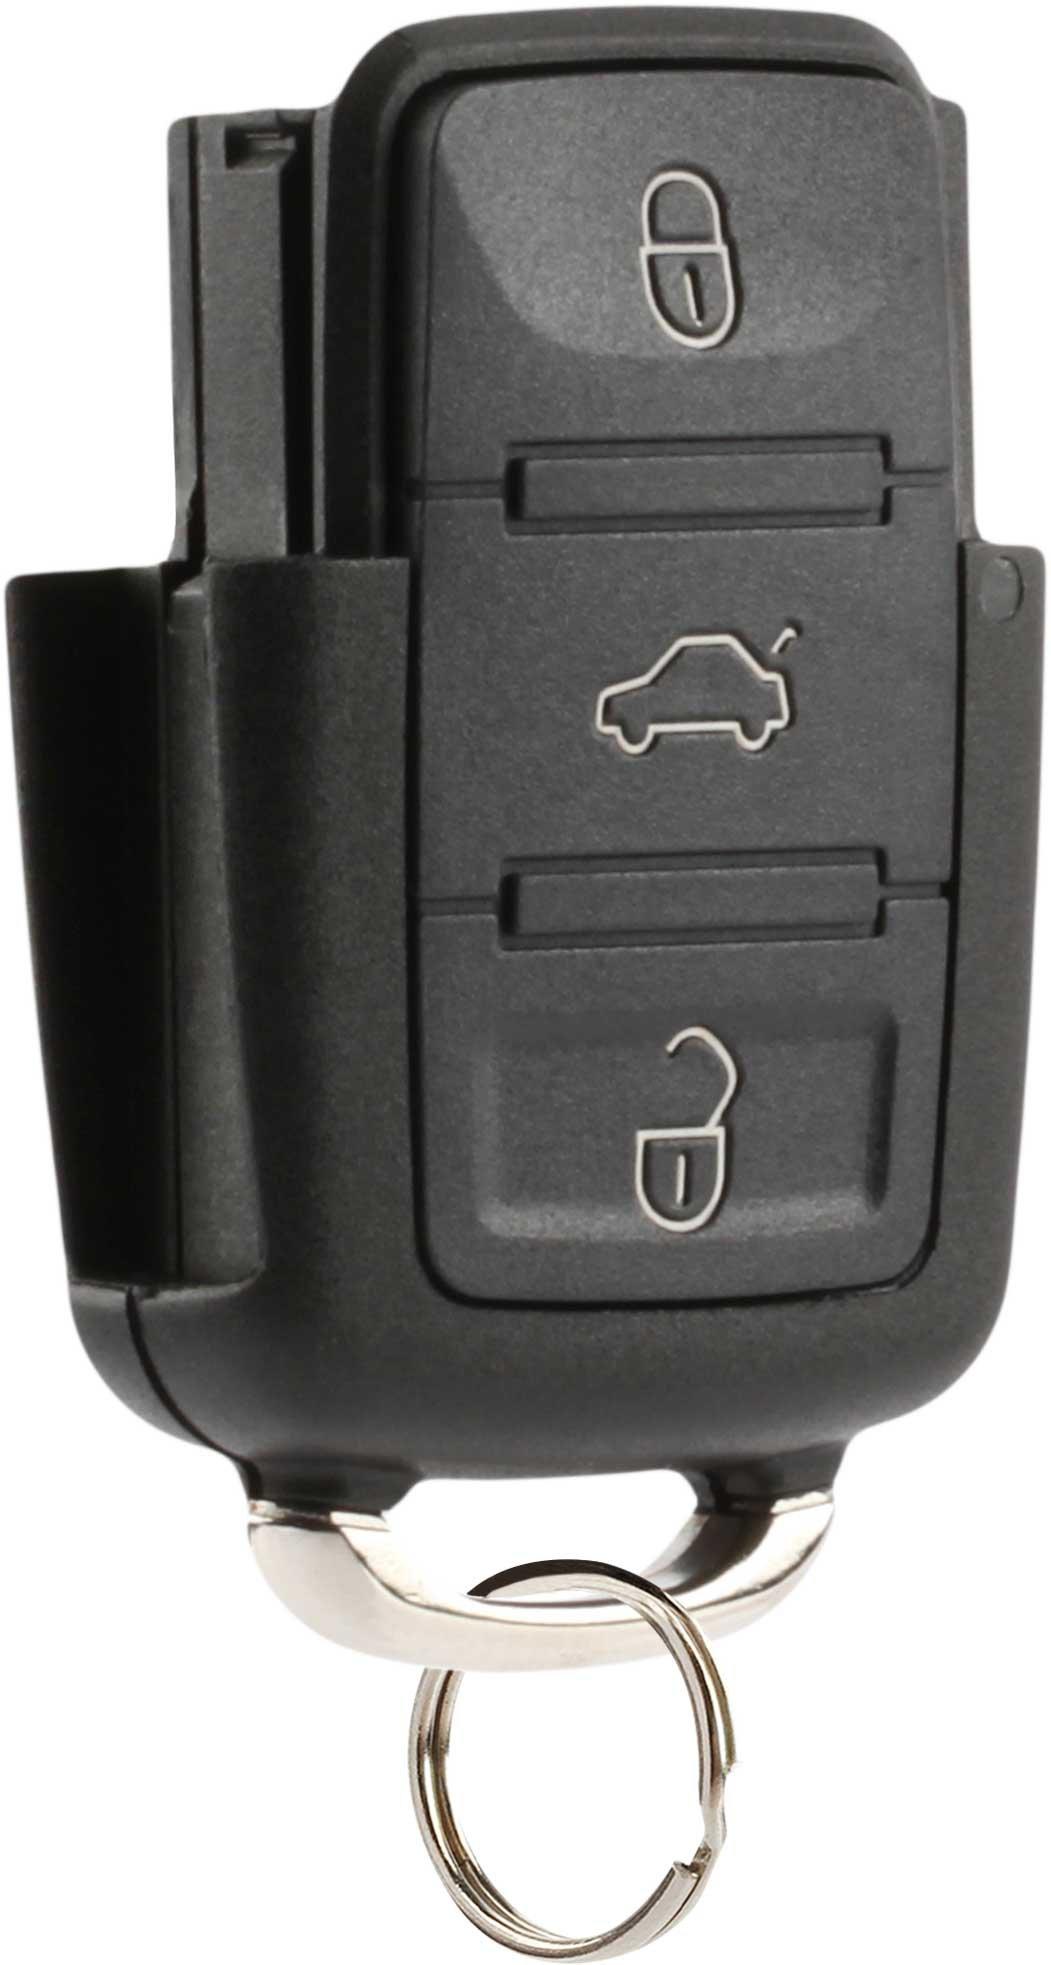 Get Quotations Flip Key Fob Keyless Entry Remote Shell Case Pad Fits Vw Beetle Golf Jetta Pat